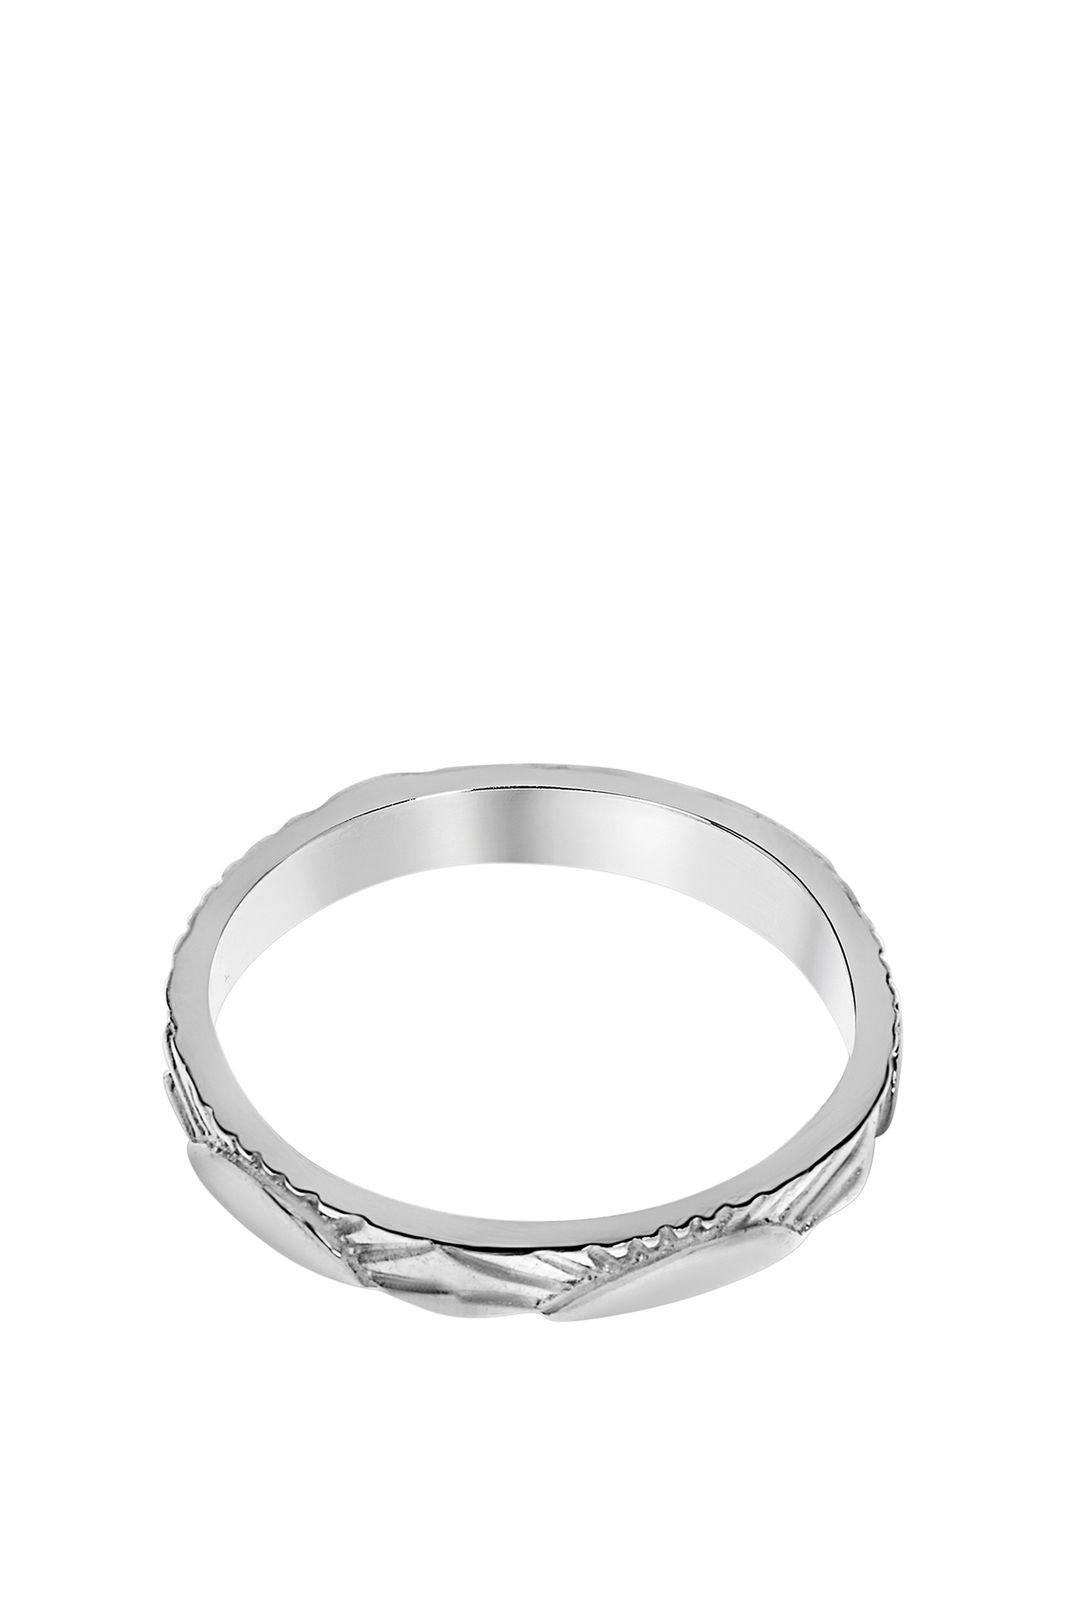 A Brend zilveren ring Roxx - Dames | Sissy-Boy